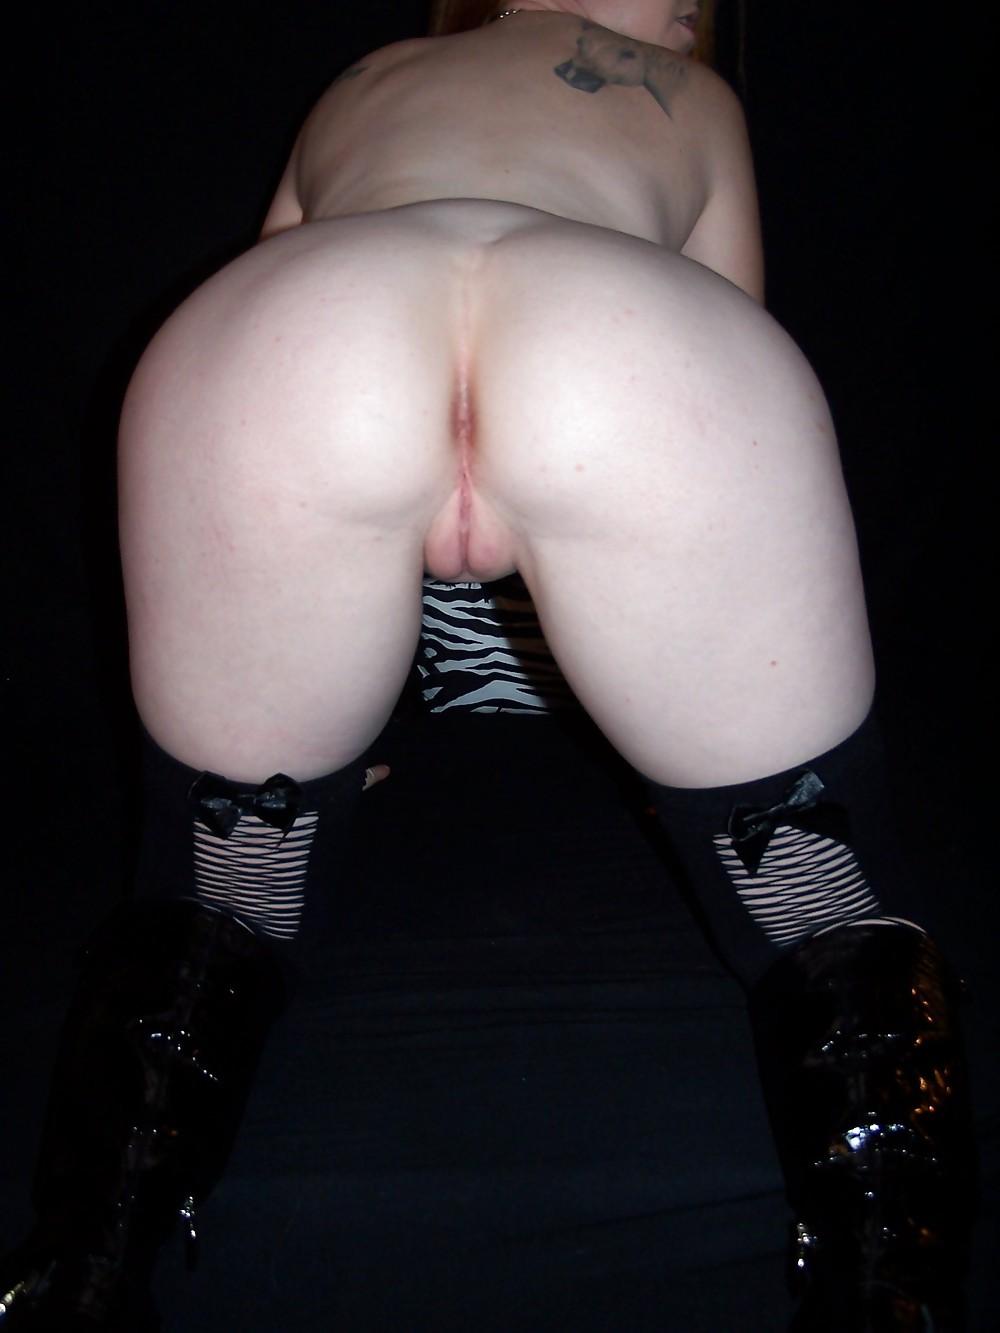 Redhead Amateur GF  Porn Pics #8525191